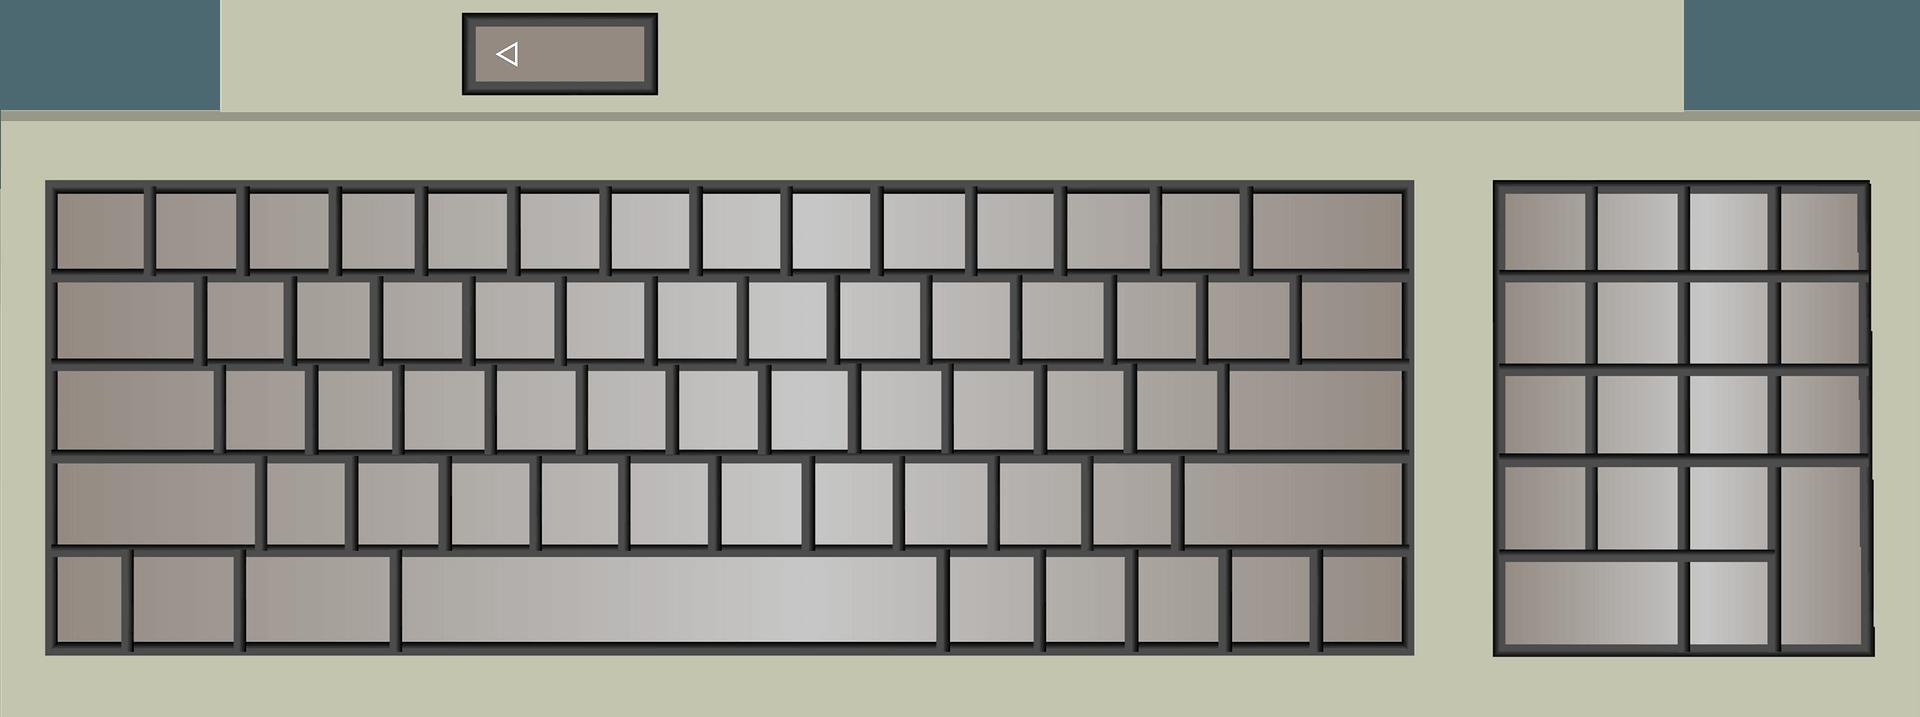 Computer Keyboard Clipart Free Download Transparent Png Creazilla